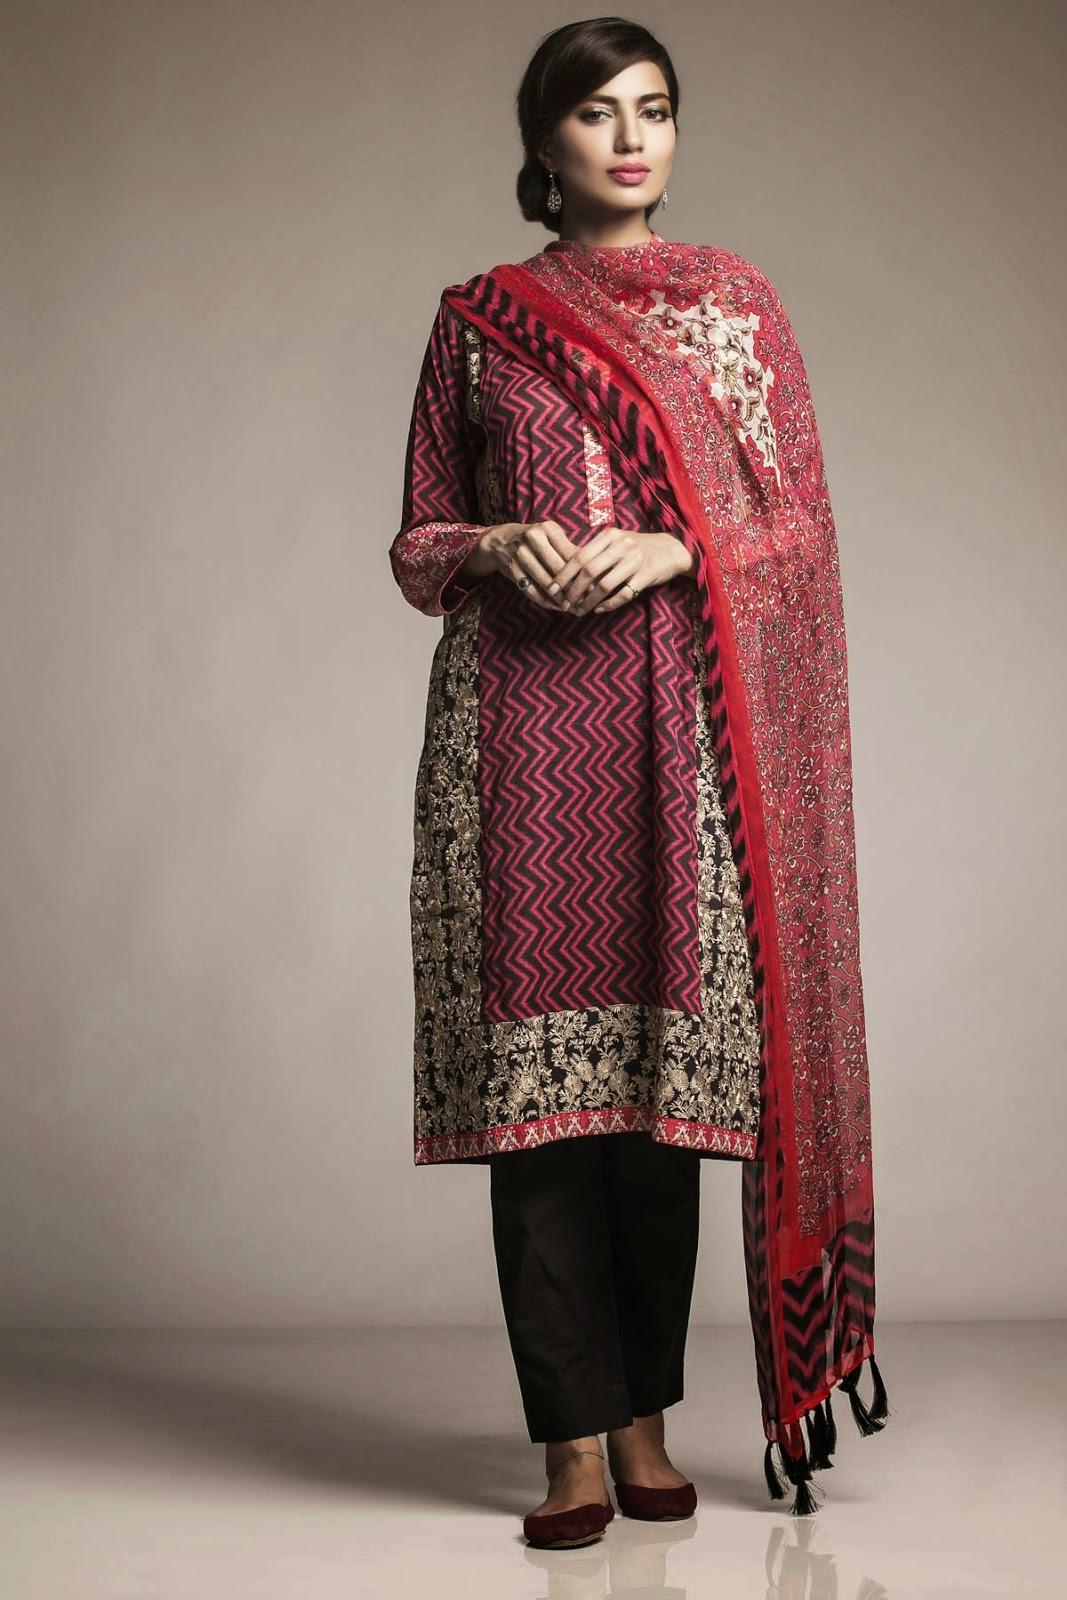 Khaadi winter sale for ladies dresses 2015 - AK Hubb